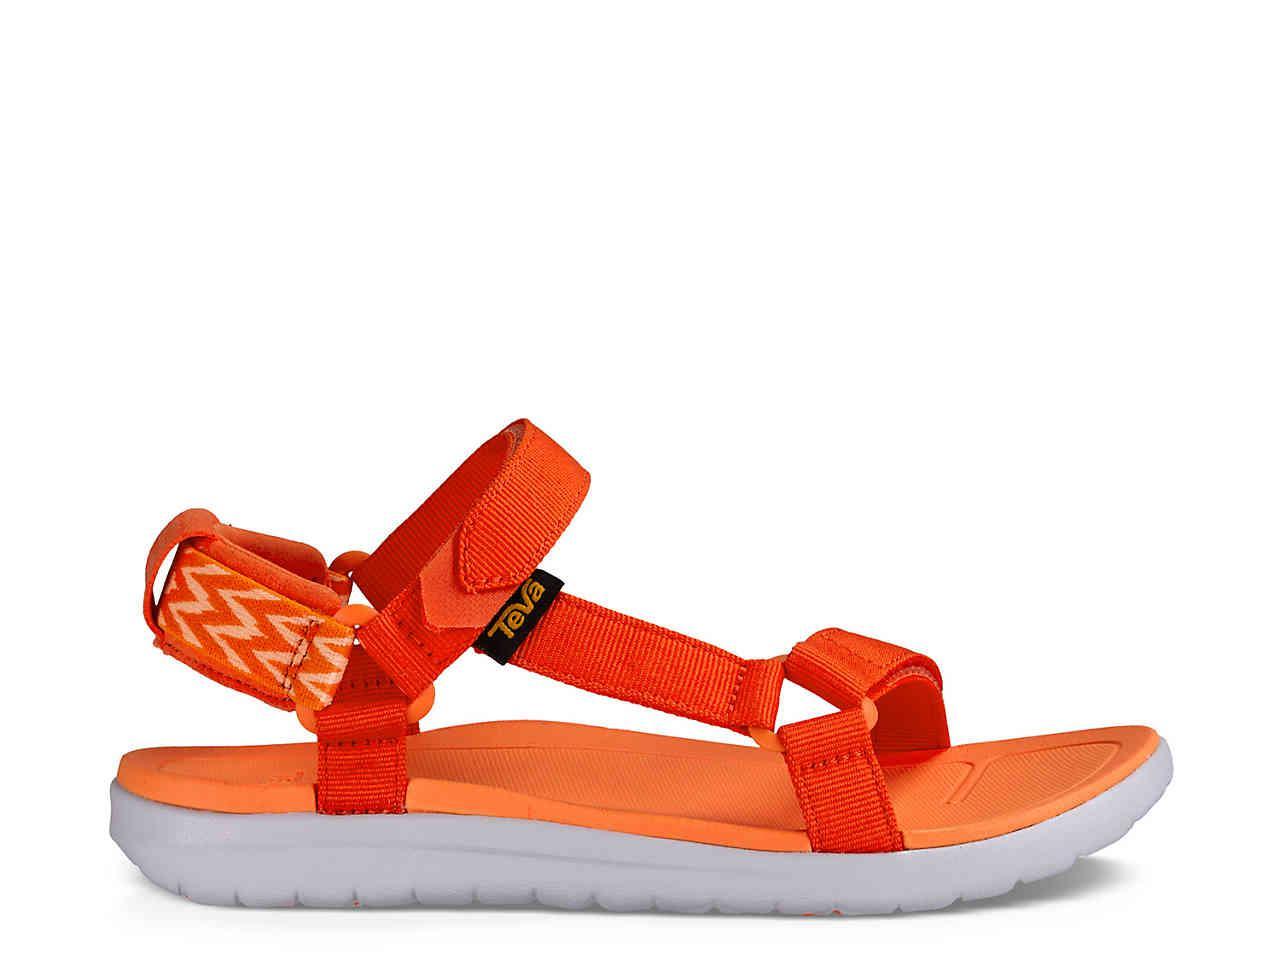 9592c2bec9a6 Lyst - Teva Sanborn Universal Sport Sandal in Orange